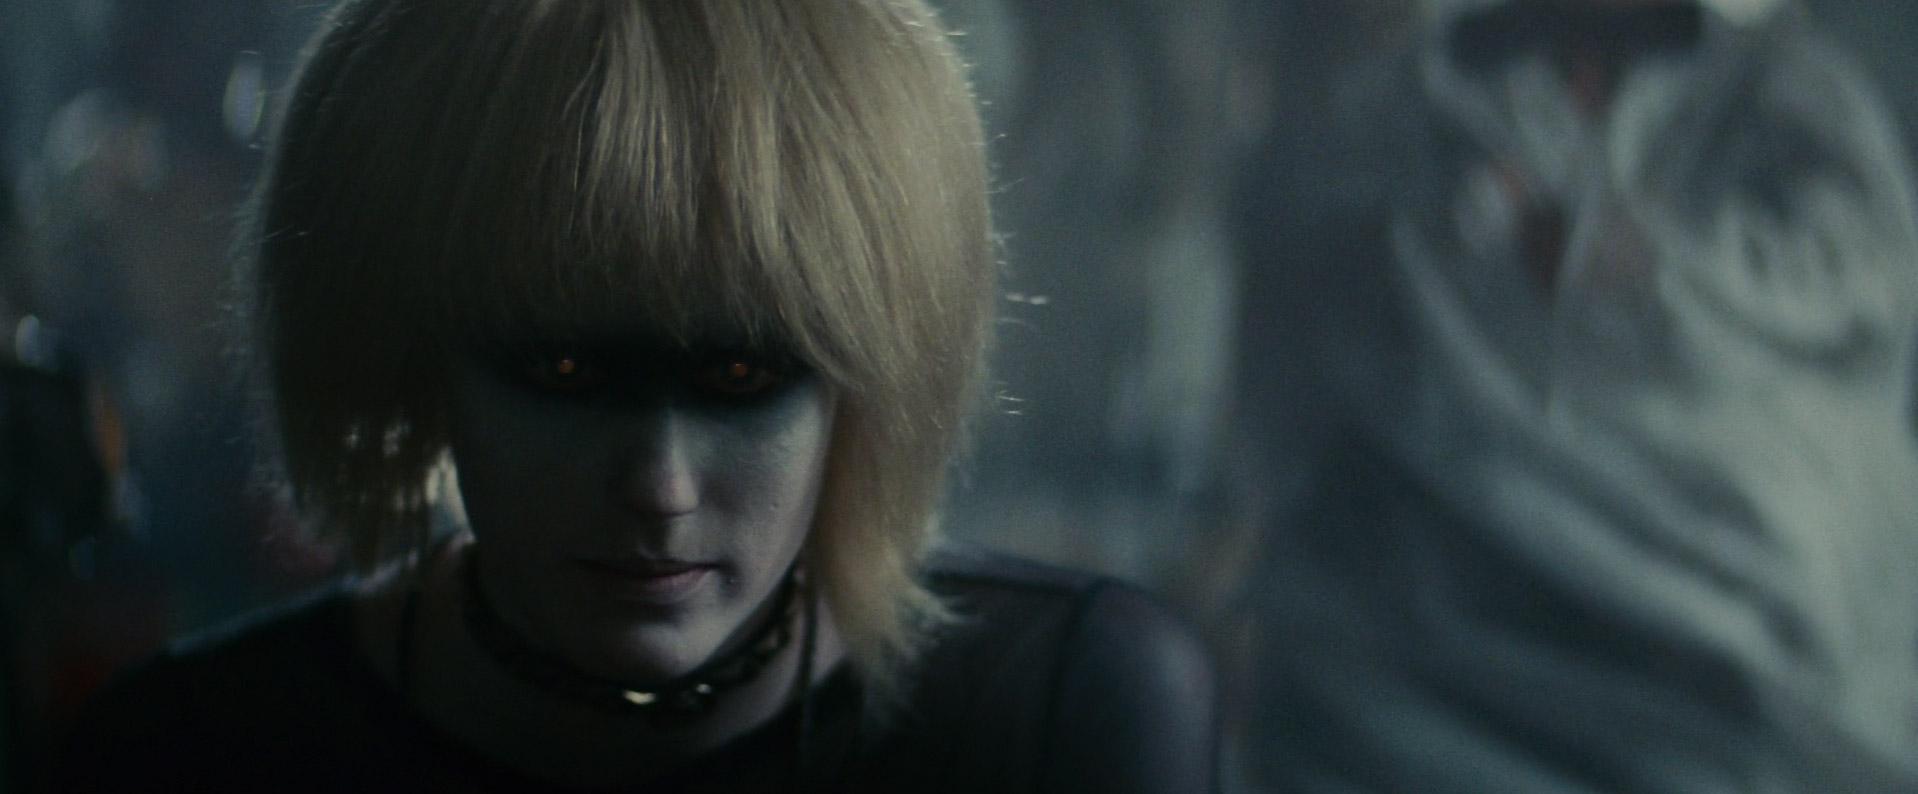 https://screenmusings.org/movie/blu-ray/Blade-Runner/images/Blade-Runner-117.jpg